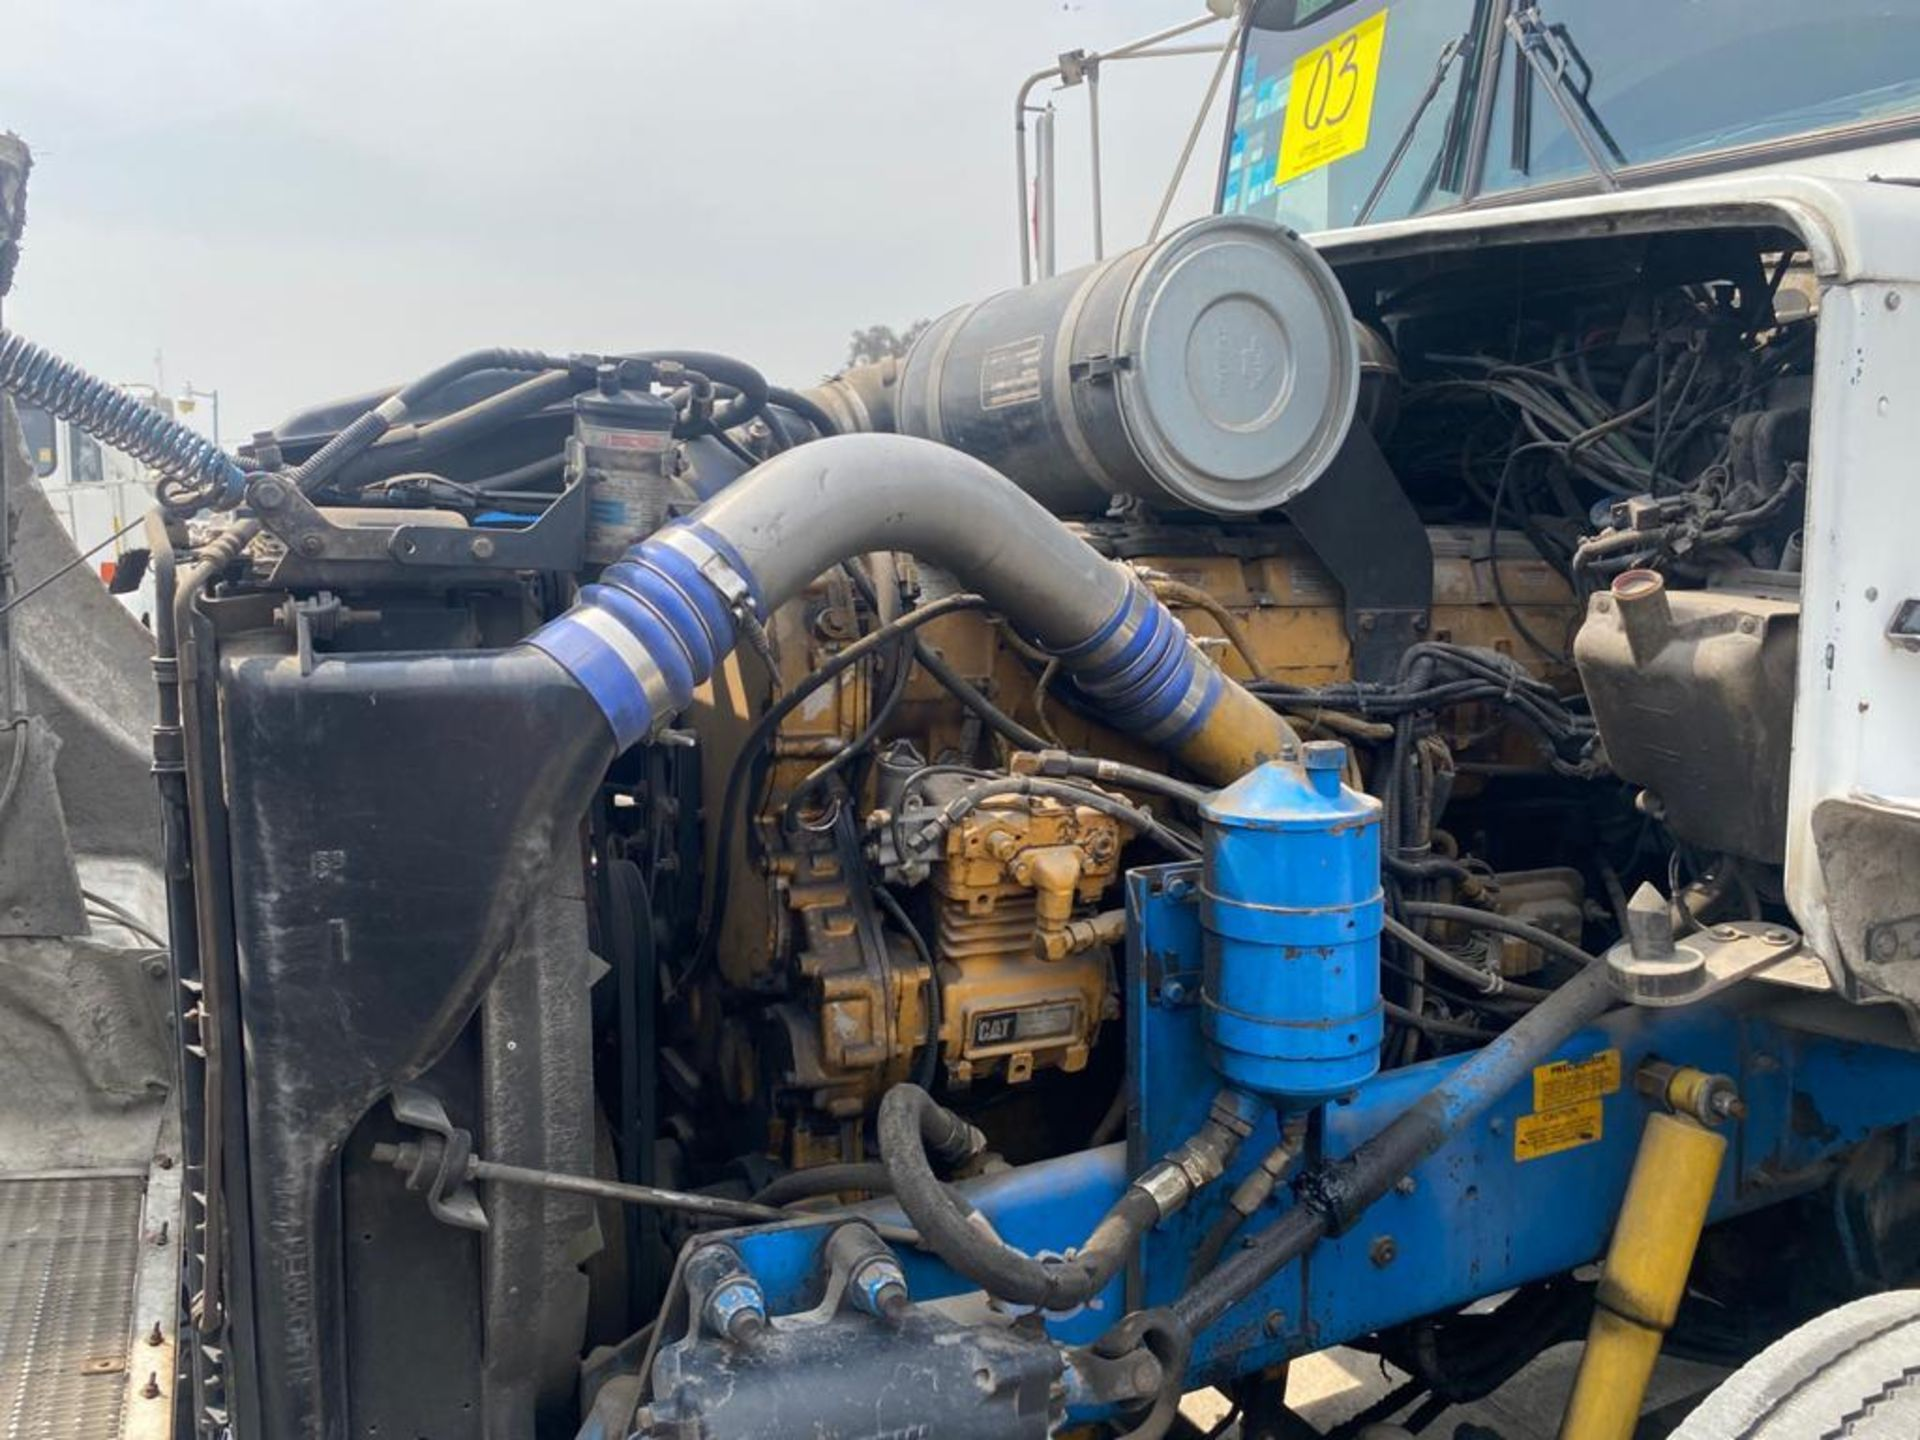 1999 Kenworth Sleeper truck tractor, standard transmission of 18 speeds - Image 59 of 62